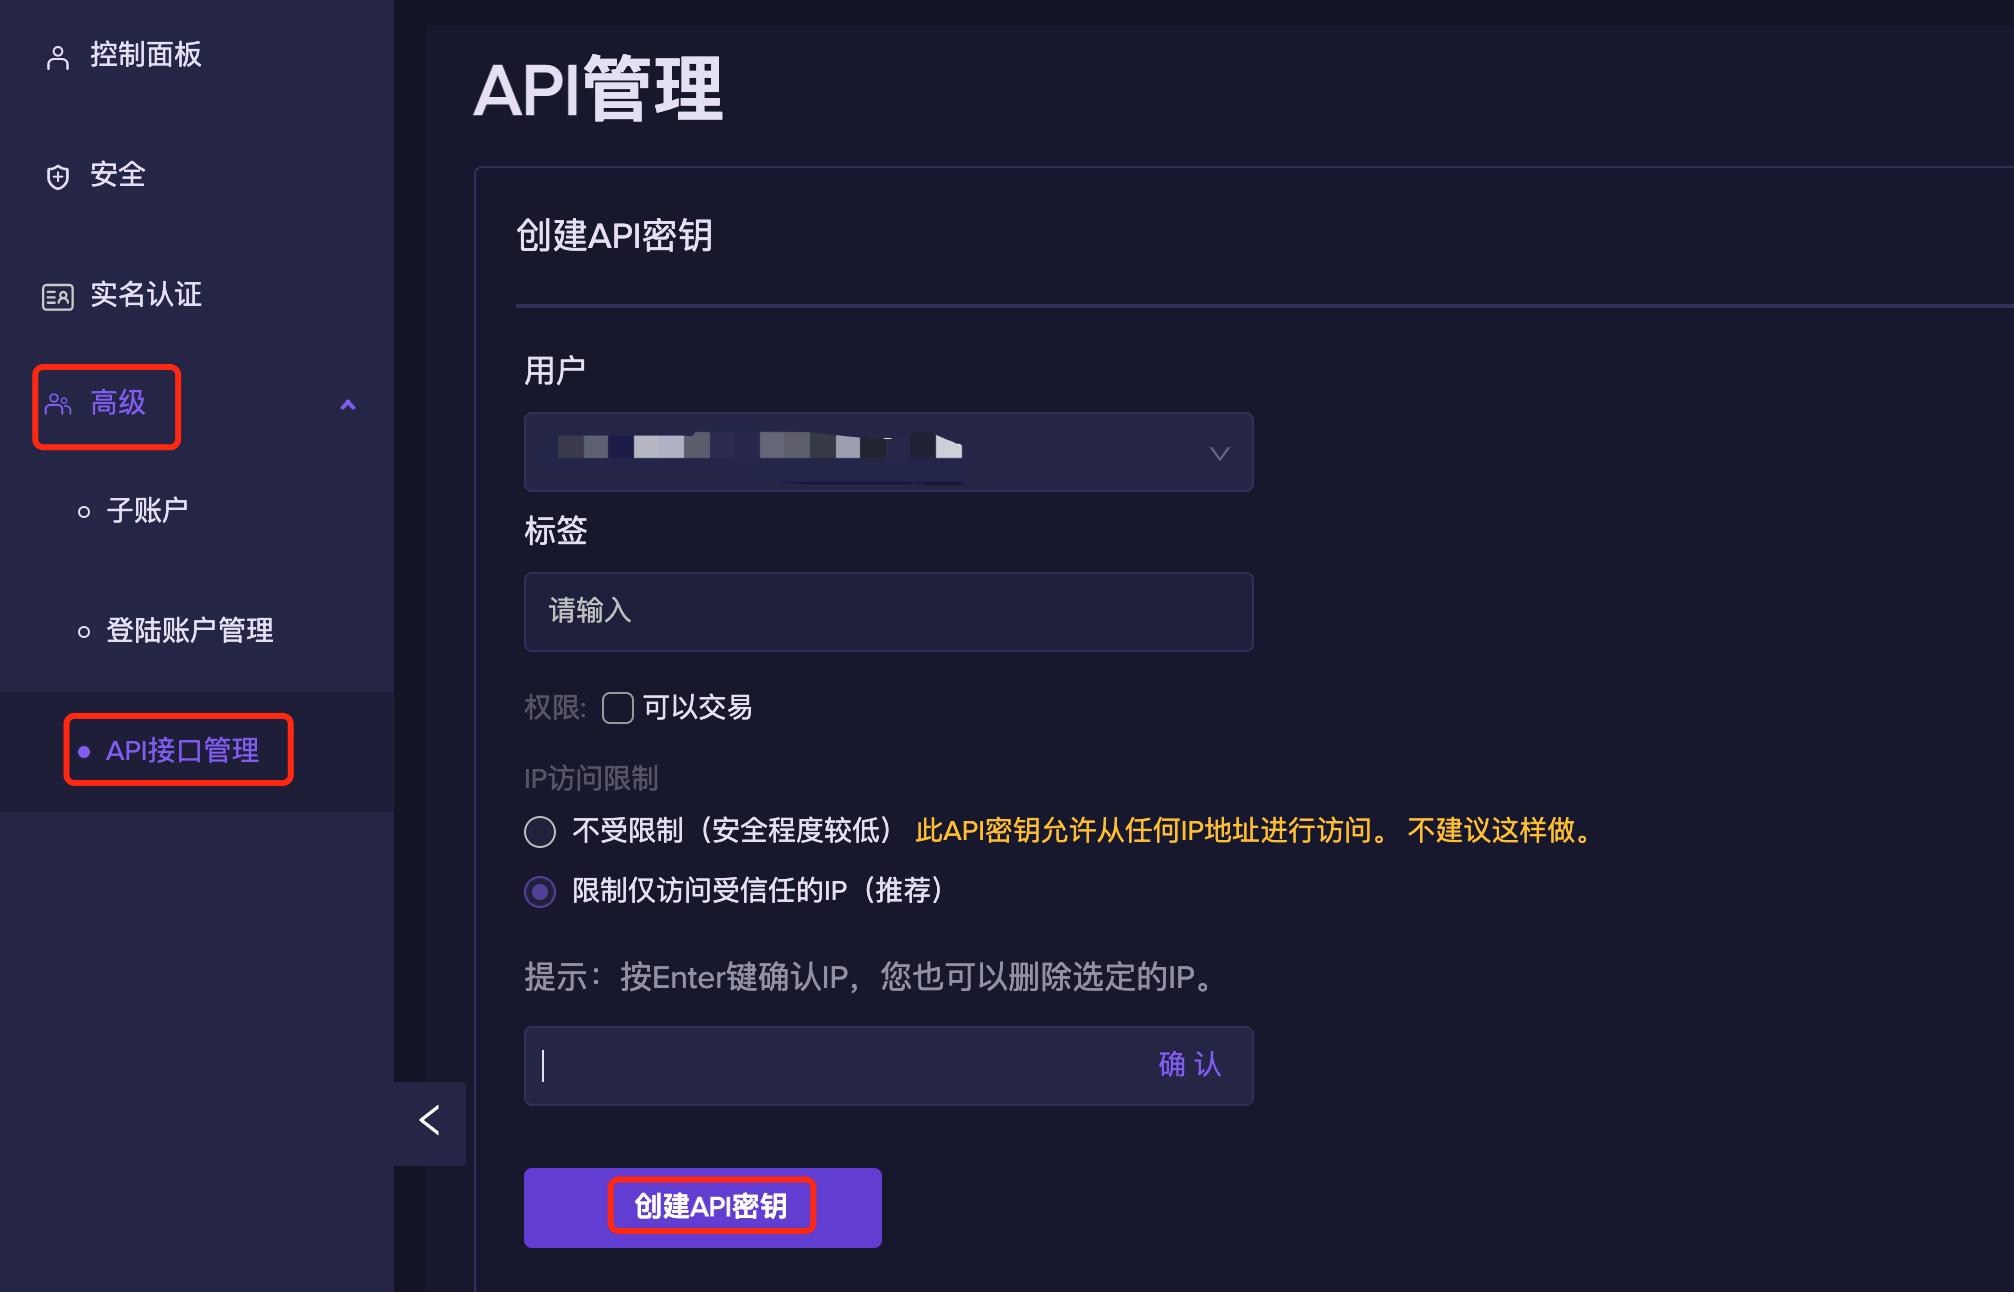 2Step1 5.1.1 Creating an API